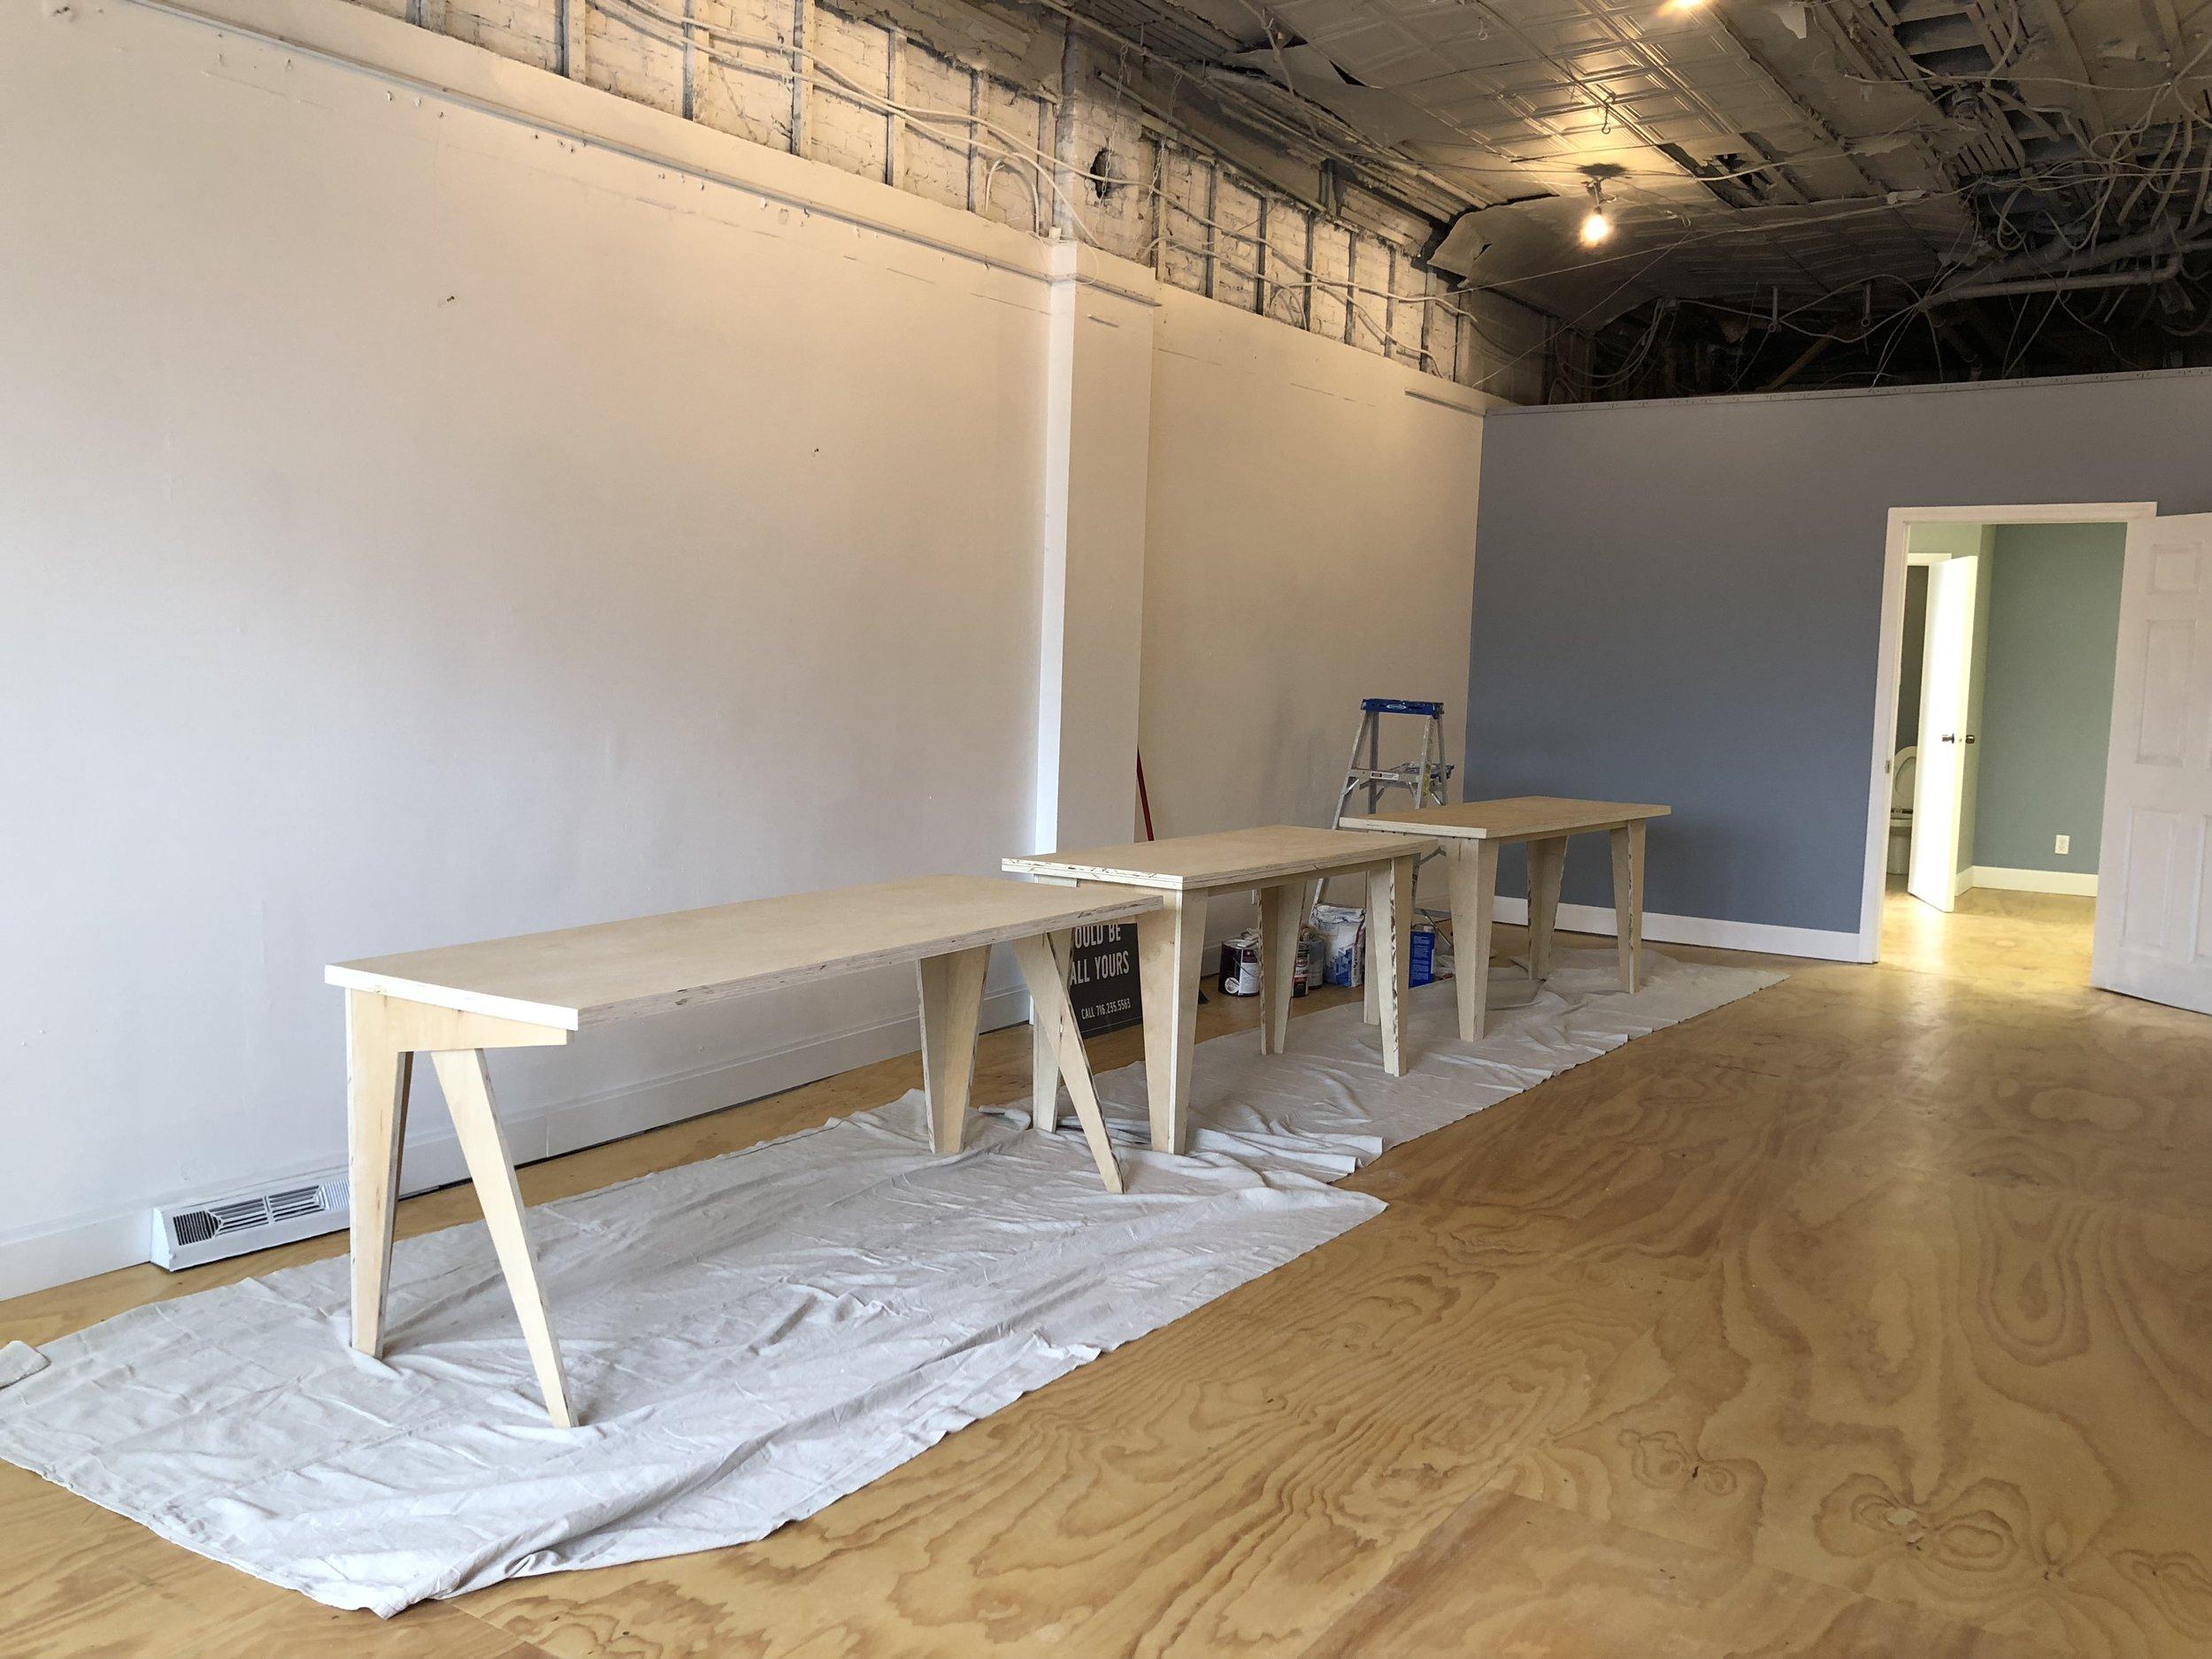 niagara street getting settled in new desks made.JPG